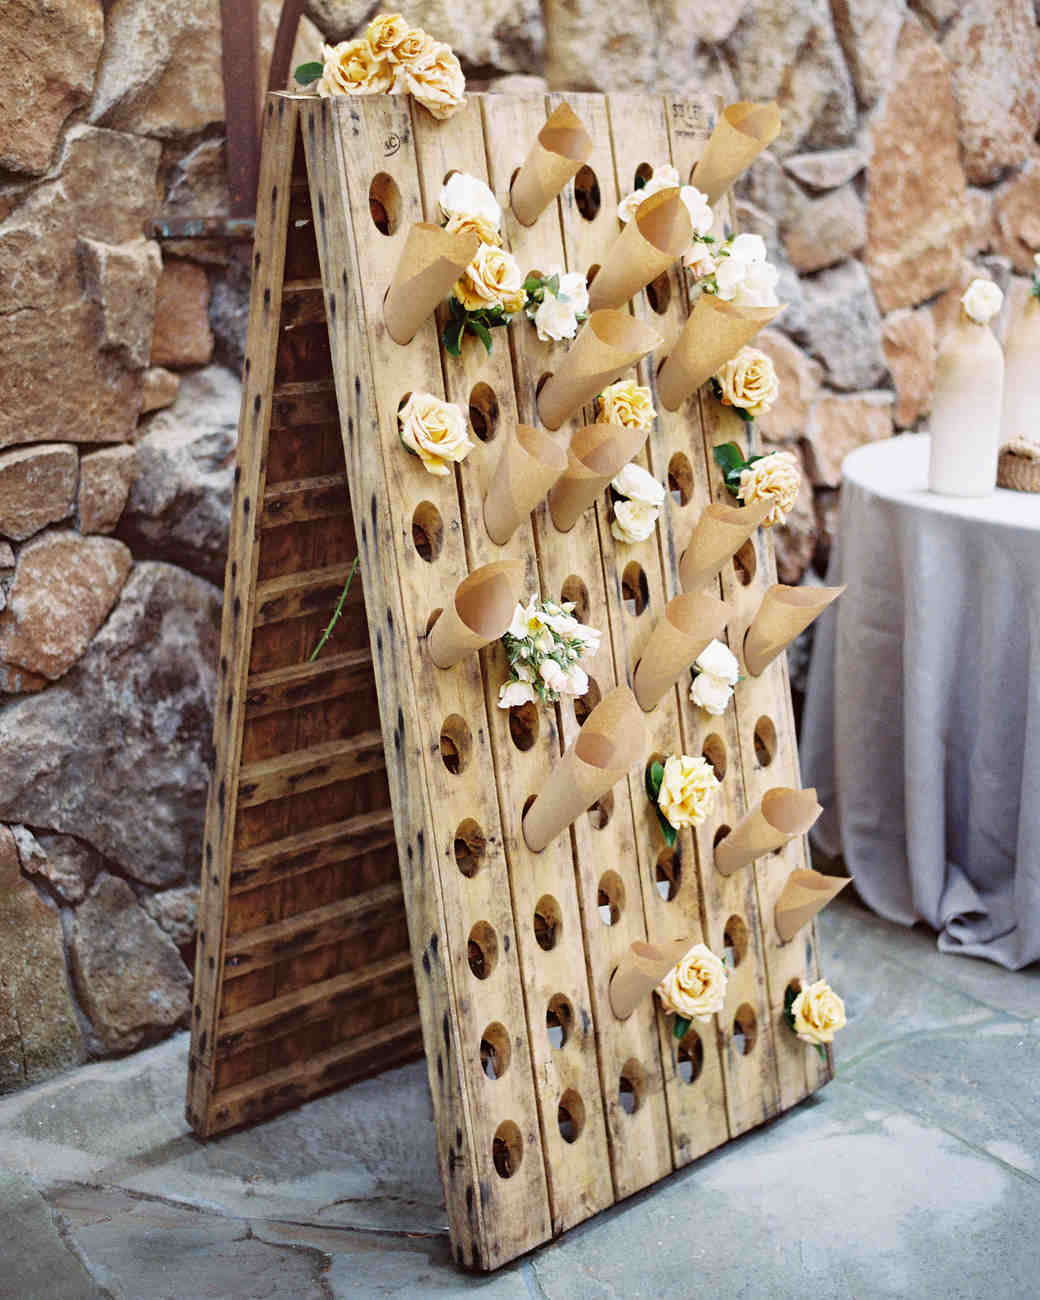 marilyn-harold-flowers-008899-001-wds109987.jpg